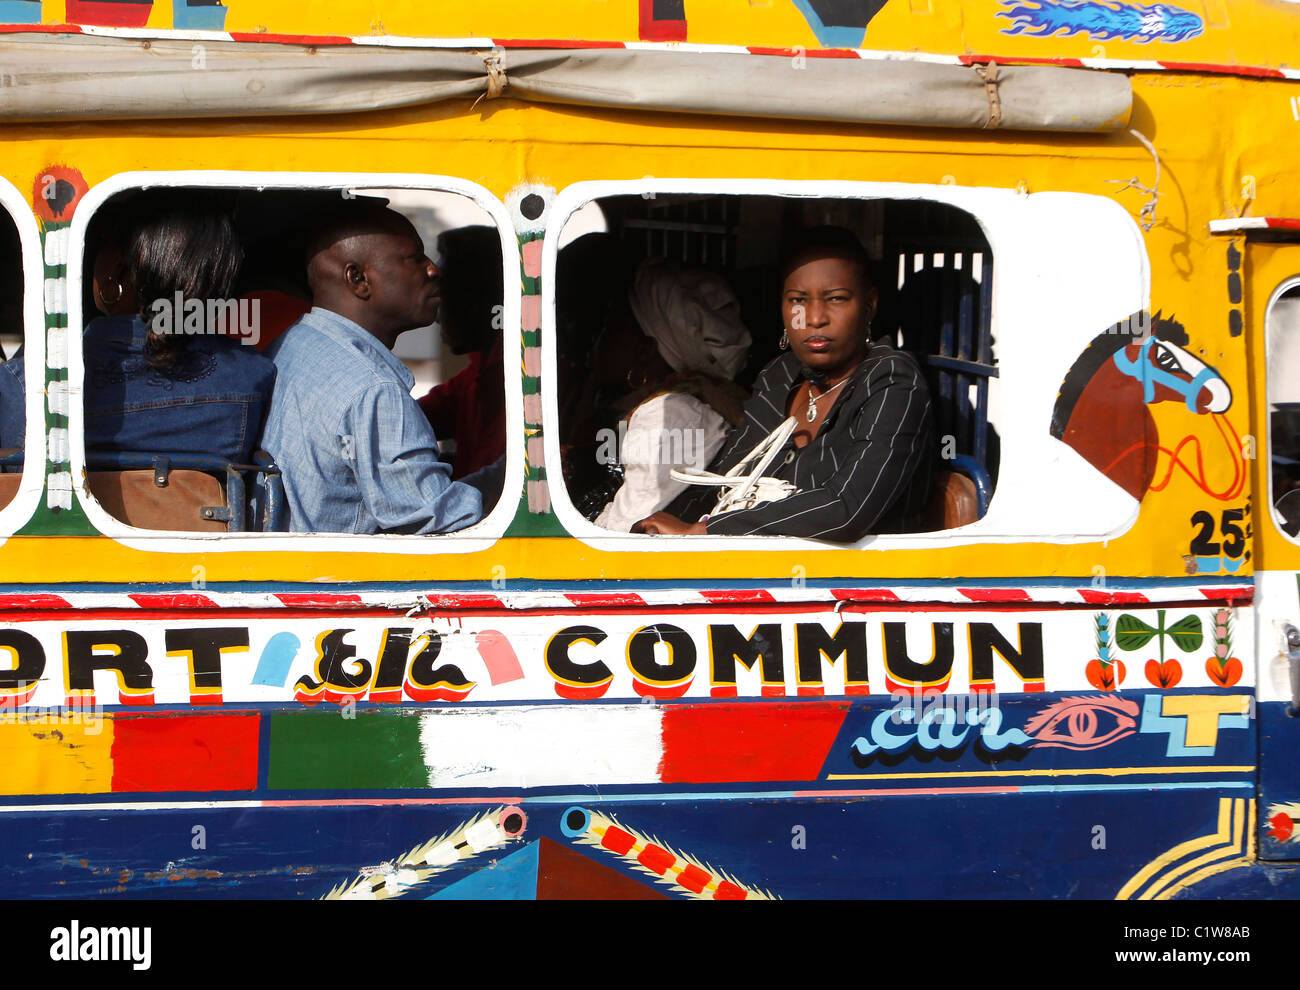 Senegal, Dakar: traditionelle öffentliche Verkehrsmittel bus Stockbild